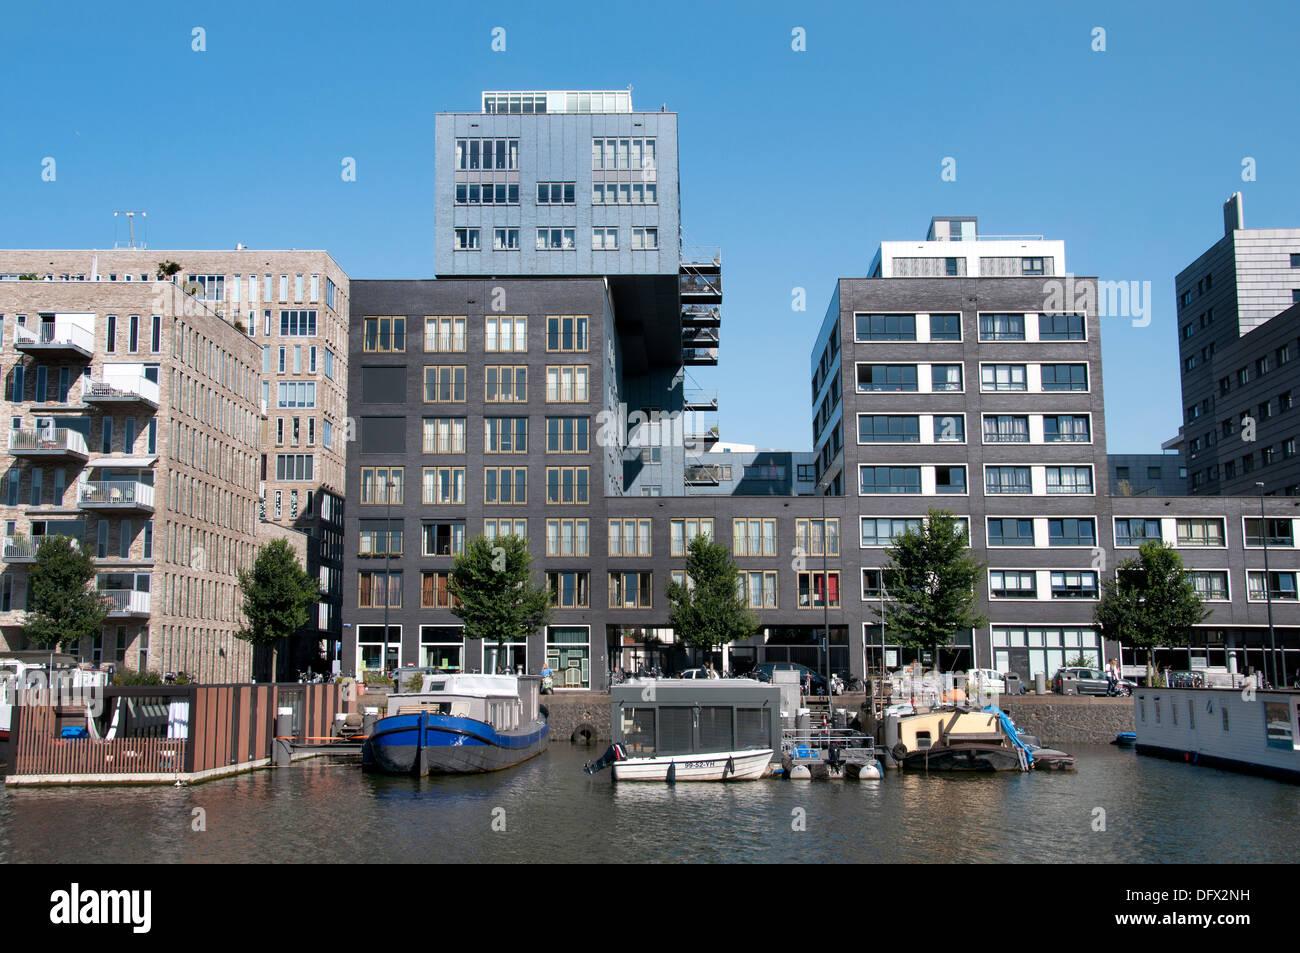 Westerdock Amsterdam Paesi Bassi architettura moderna Immagini Stock